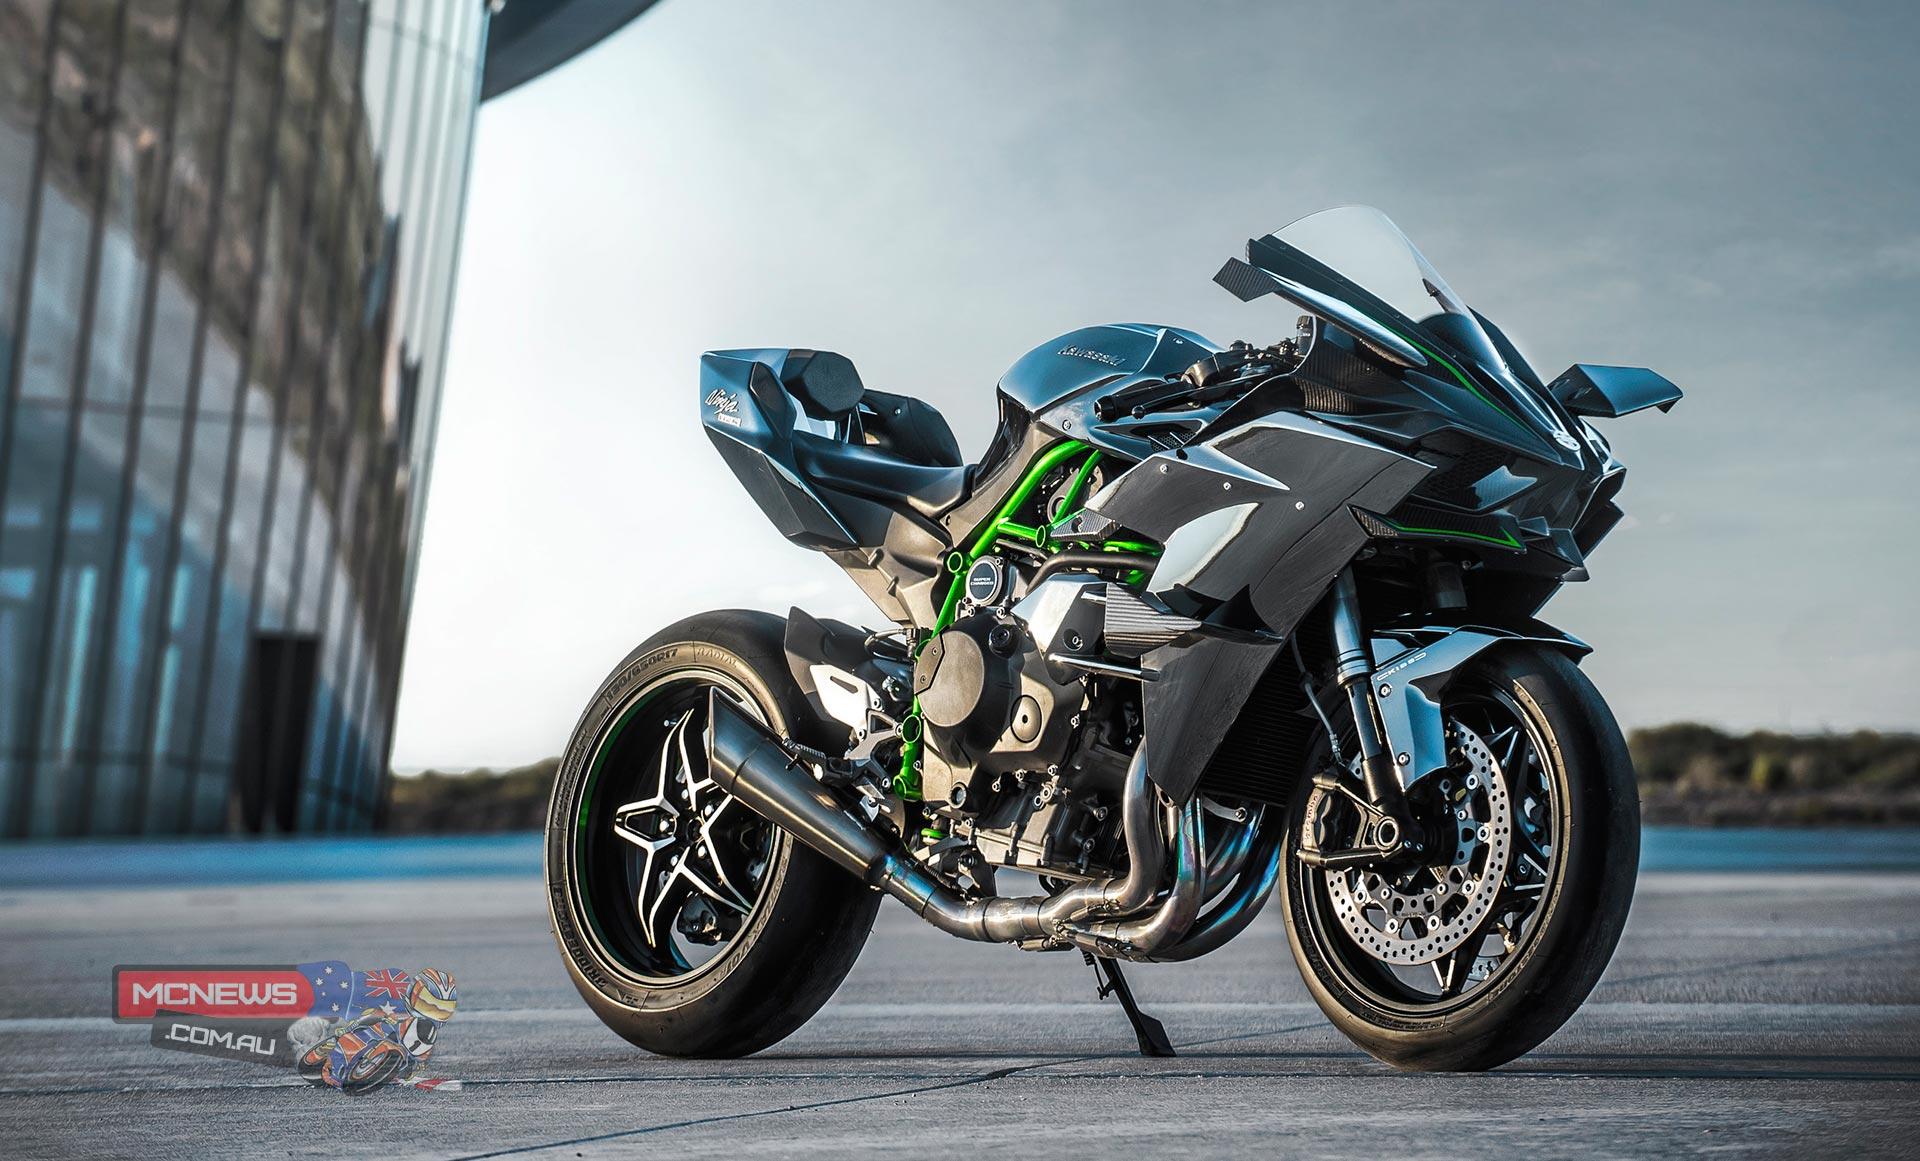 2015 Kawasaki Vulcan S Announced also Watch together with 95032 Kawasaki Ninja H2h2r V3 1 besides 8120 moreover Kawasaki Ninja H2 Arrives New Benchmark For Road Legal Performance. on 2017 kawasaki ninja hr2